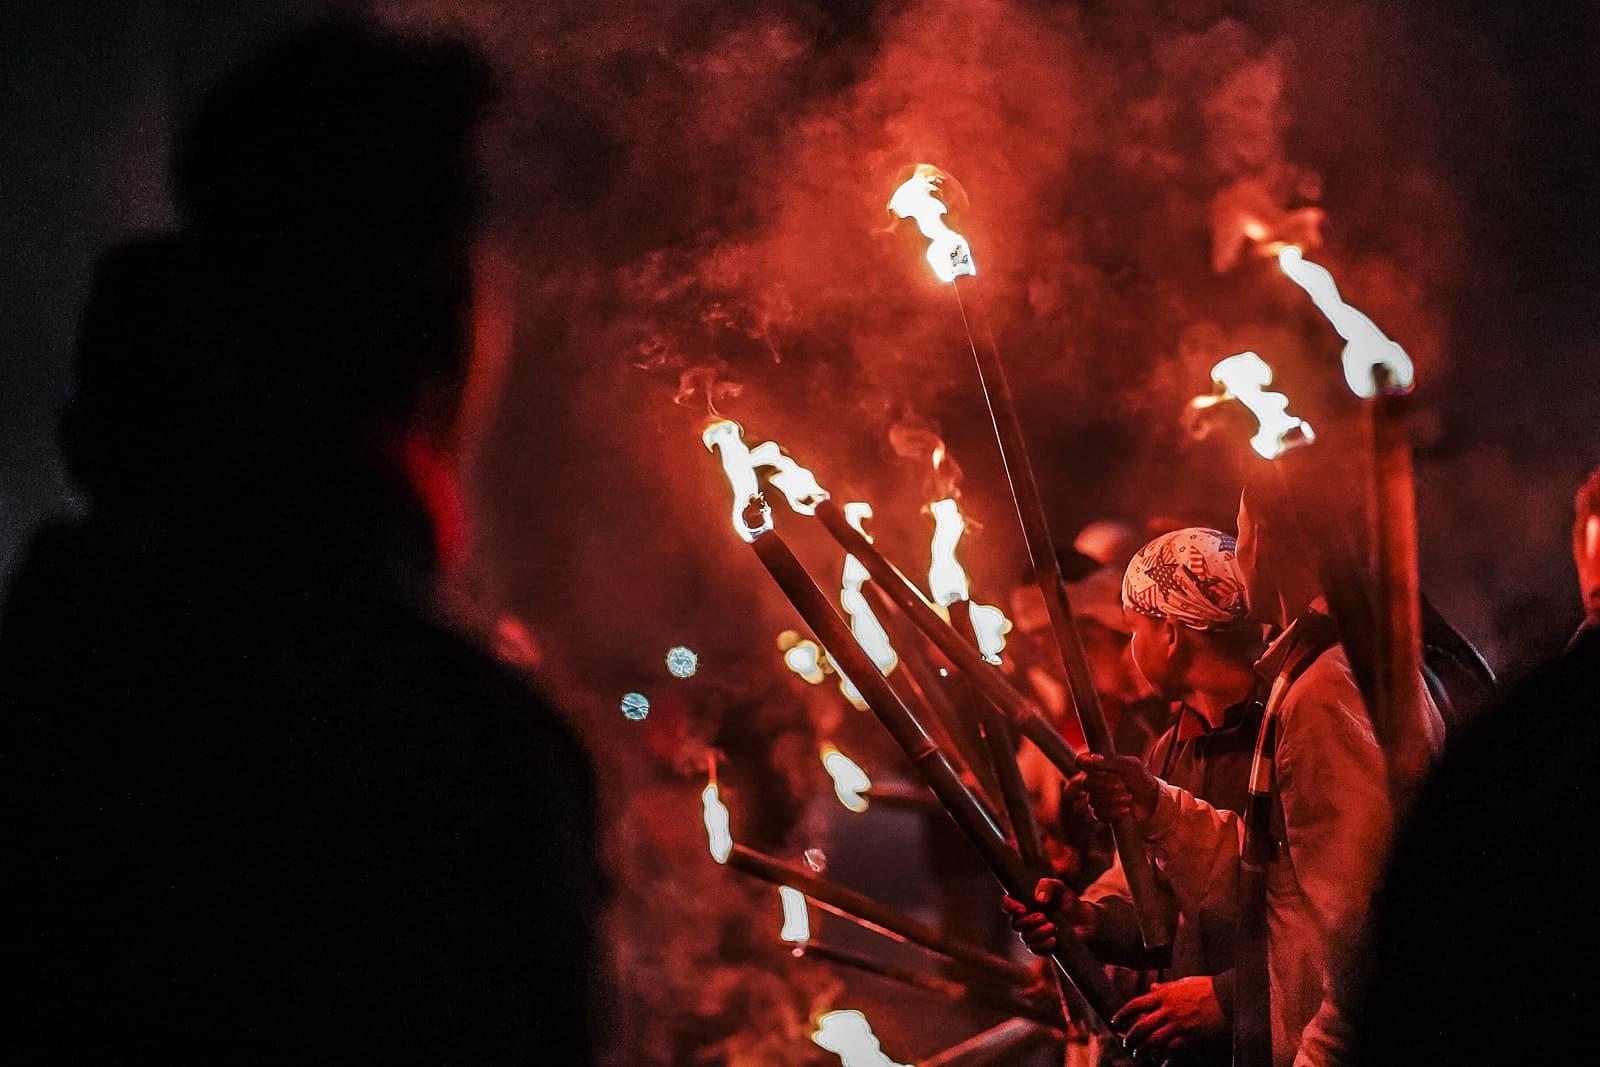 Manifestants contra el govern de L'Índia el 19 de desembre a Jorhat. Fotografia de A Luit Chaliha/Zuma Wire.